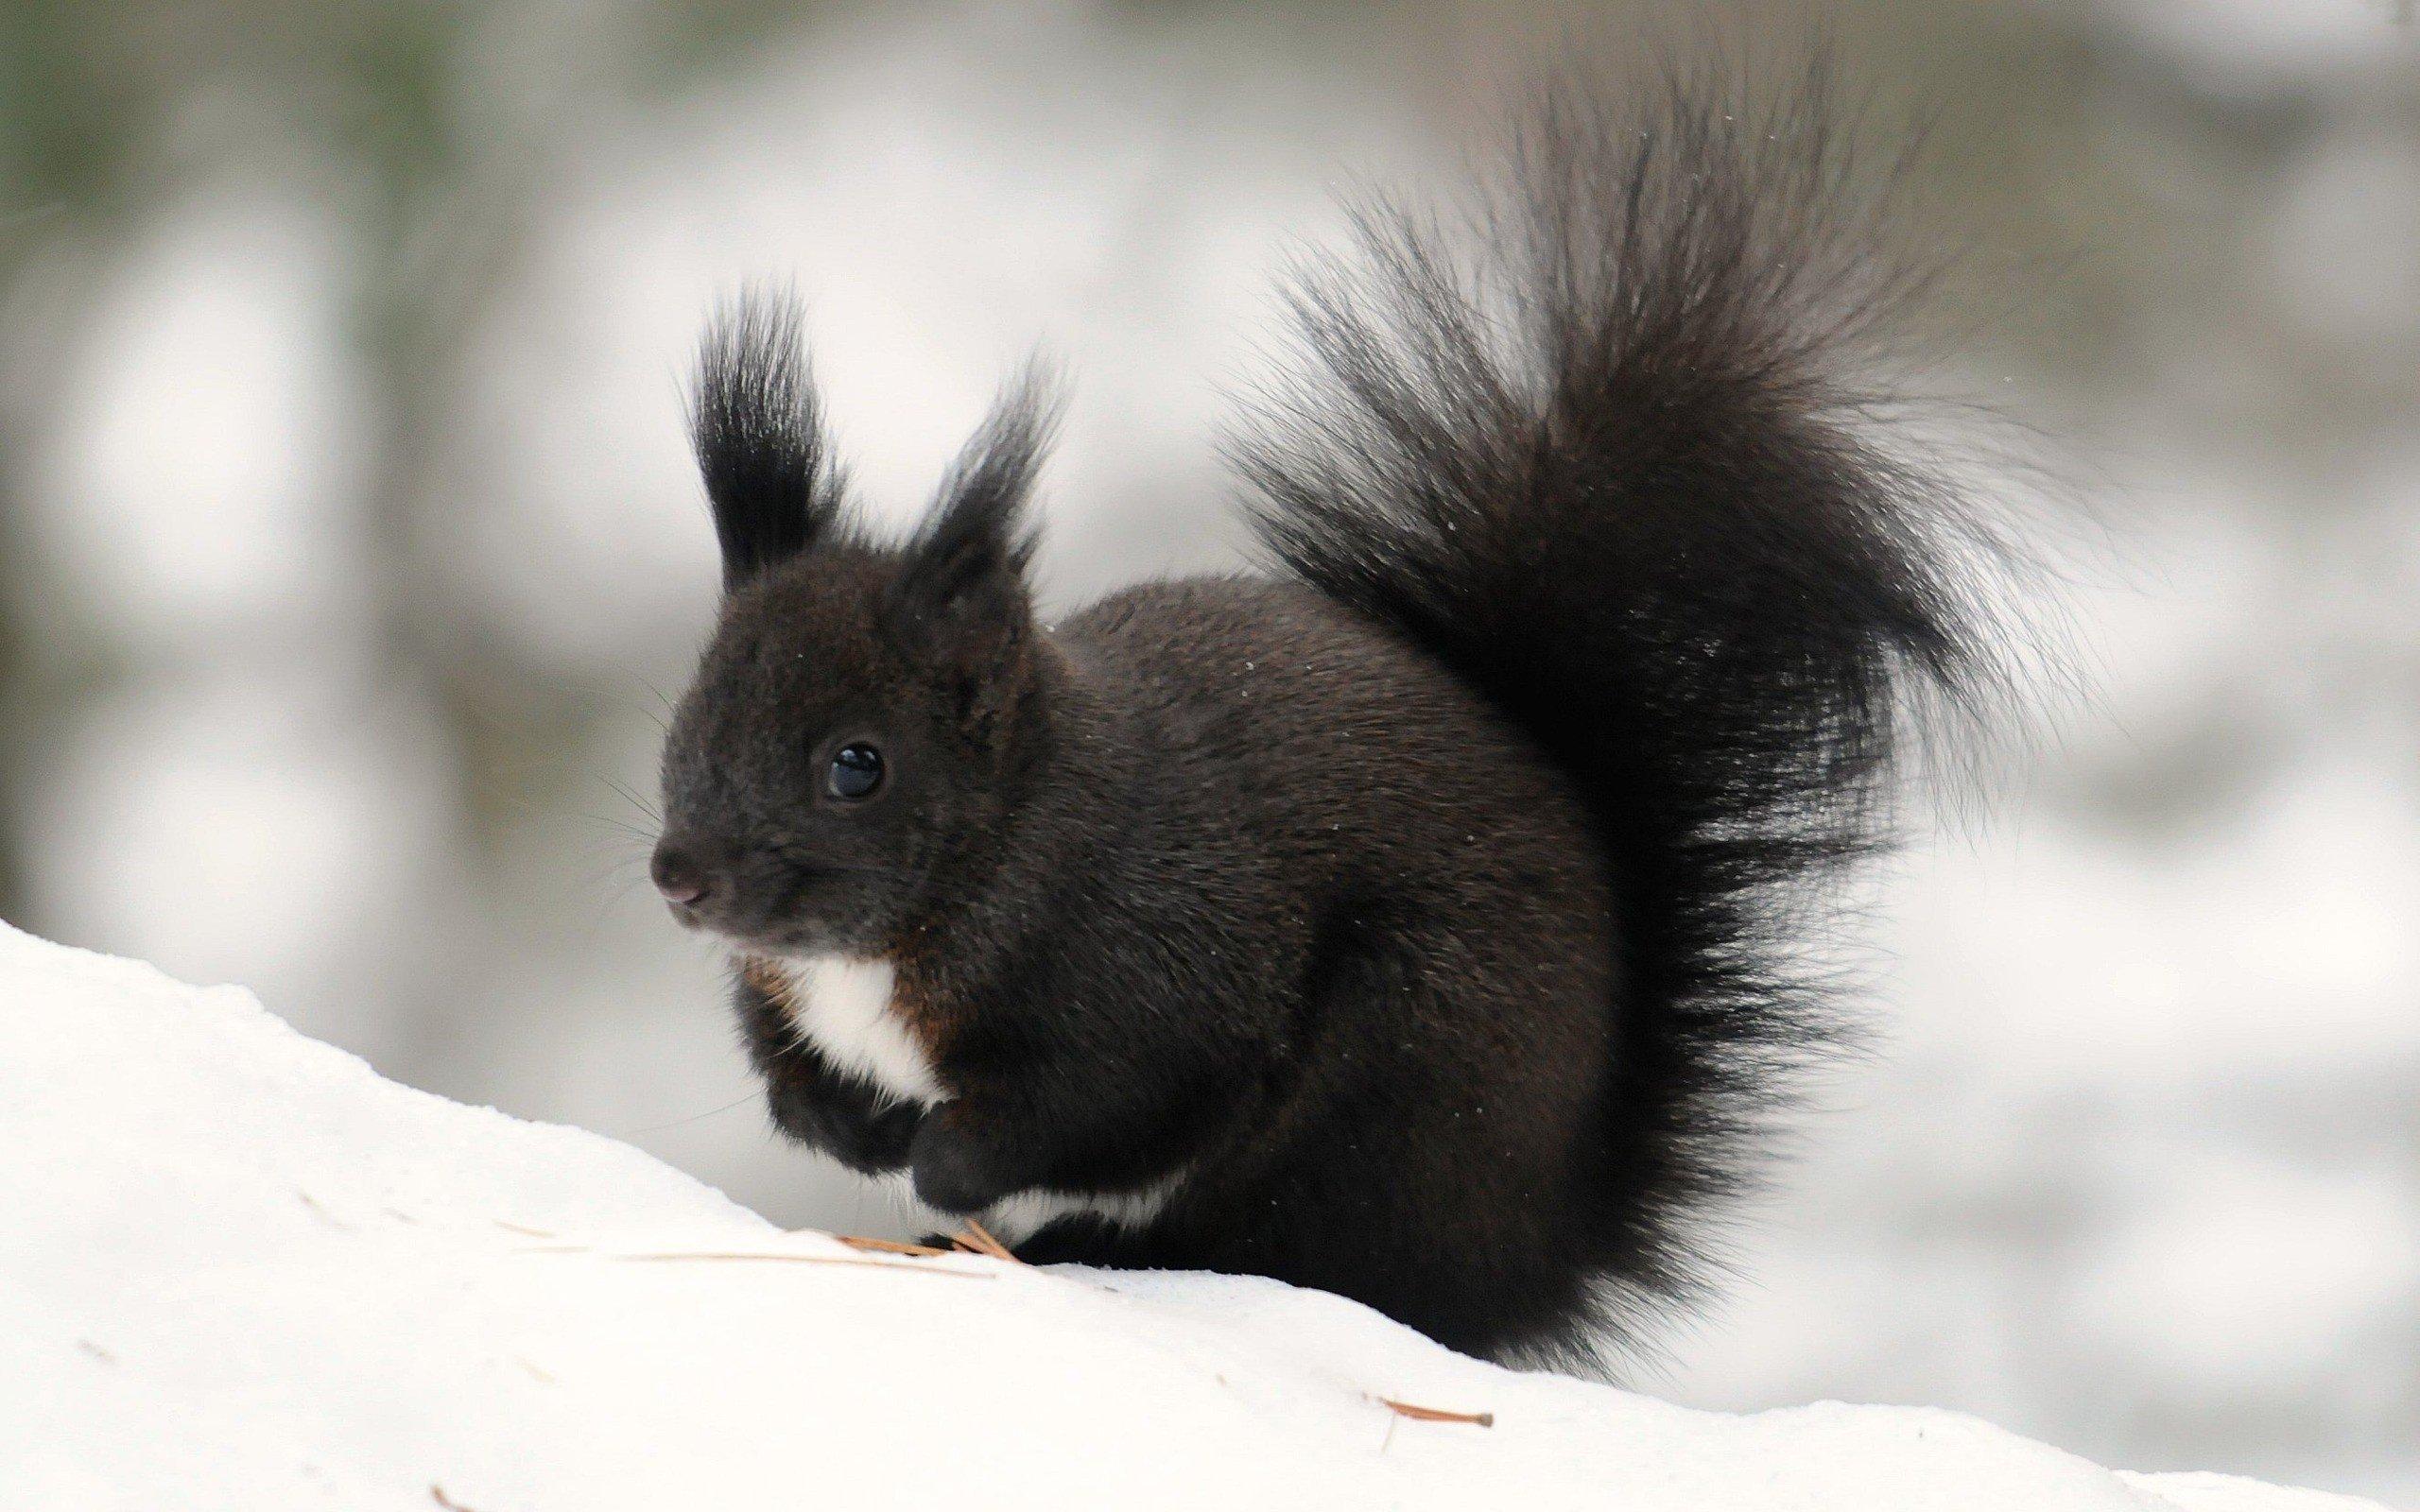 snow black animals outdoors fur squirrels wallpaper. Black Bedroom Furniture Sets. Home Design Ideas